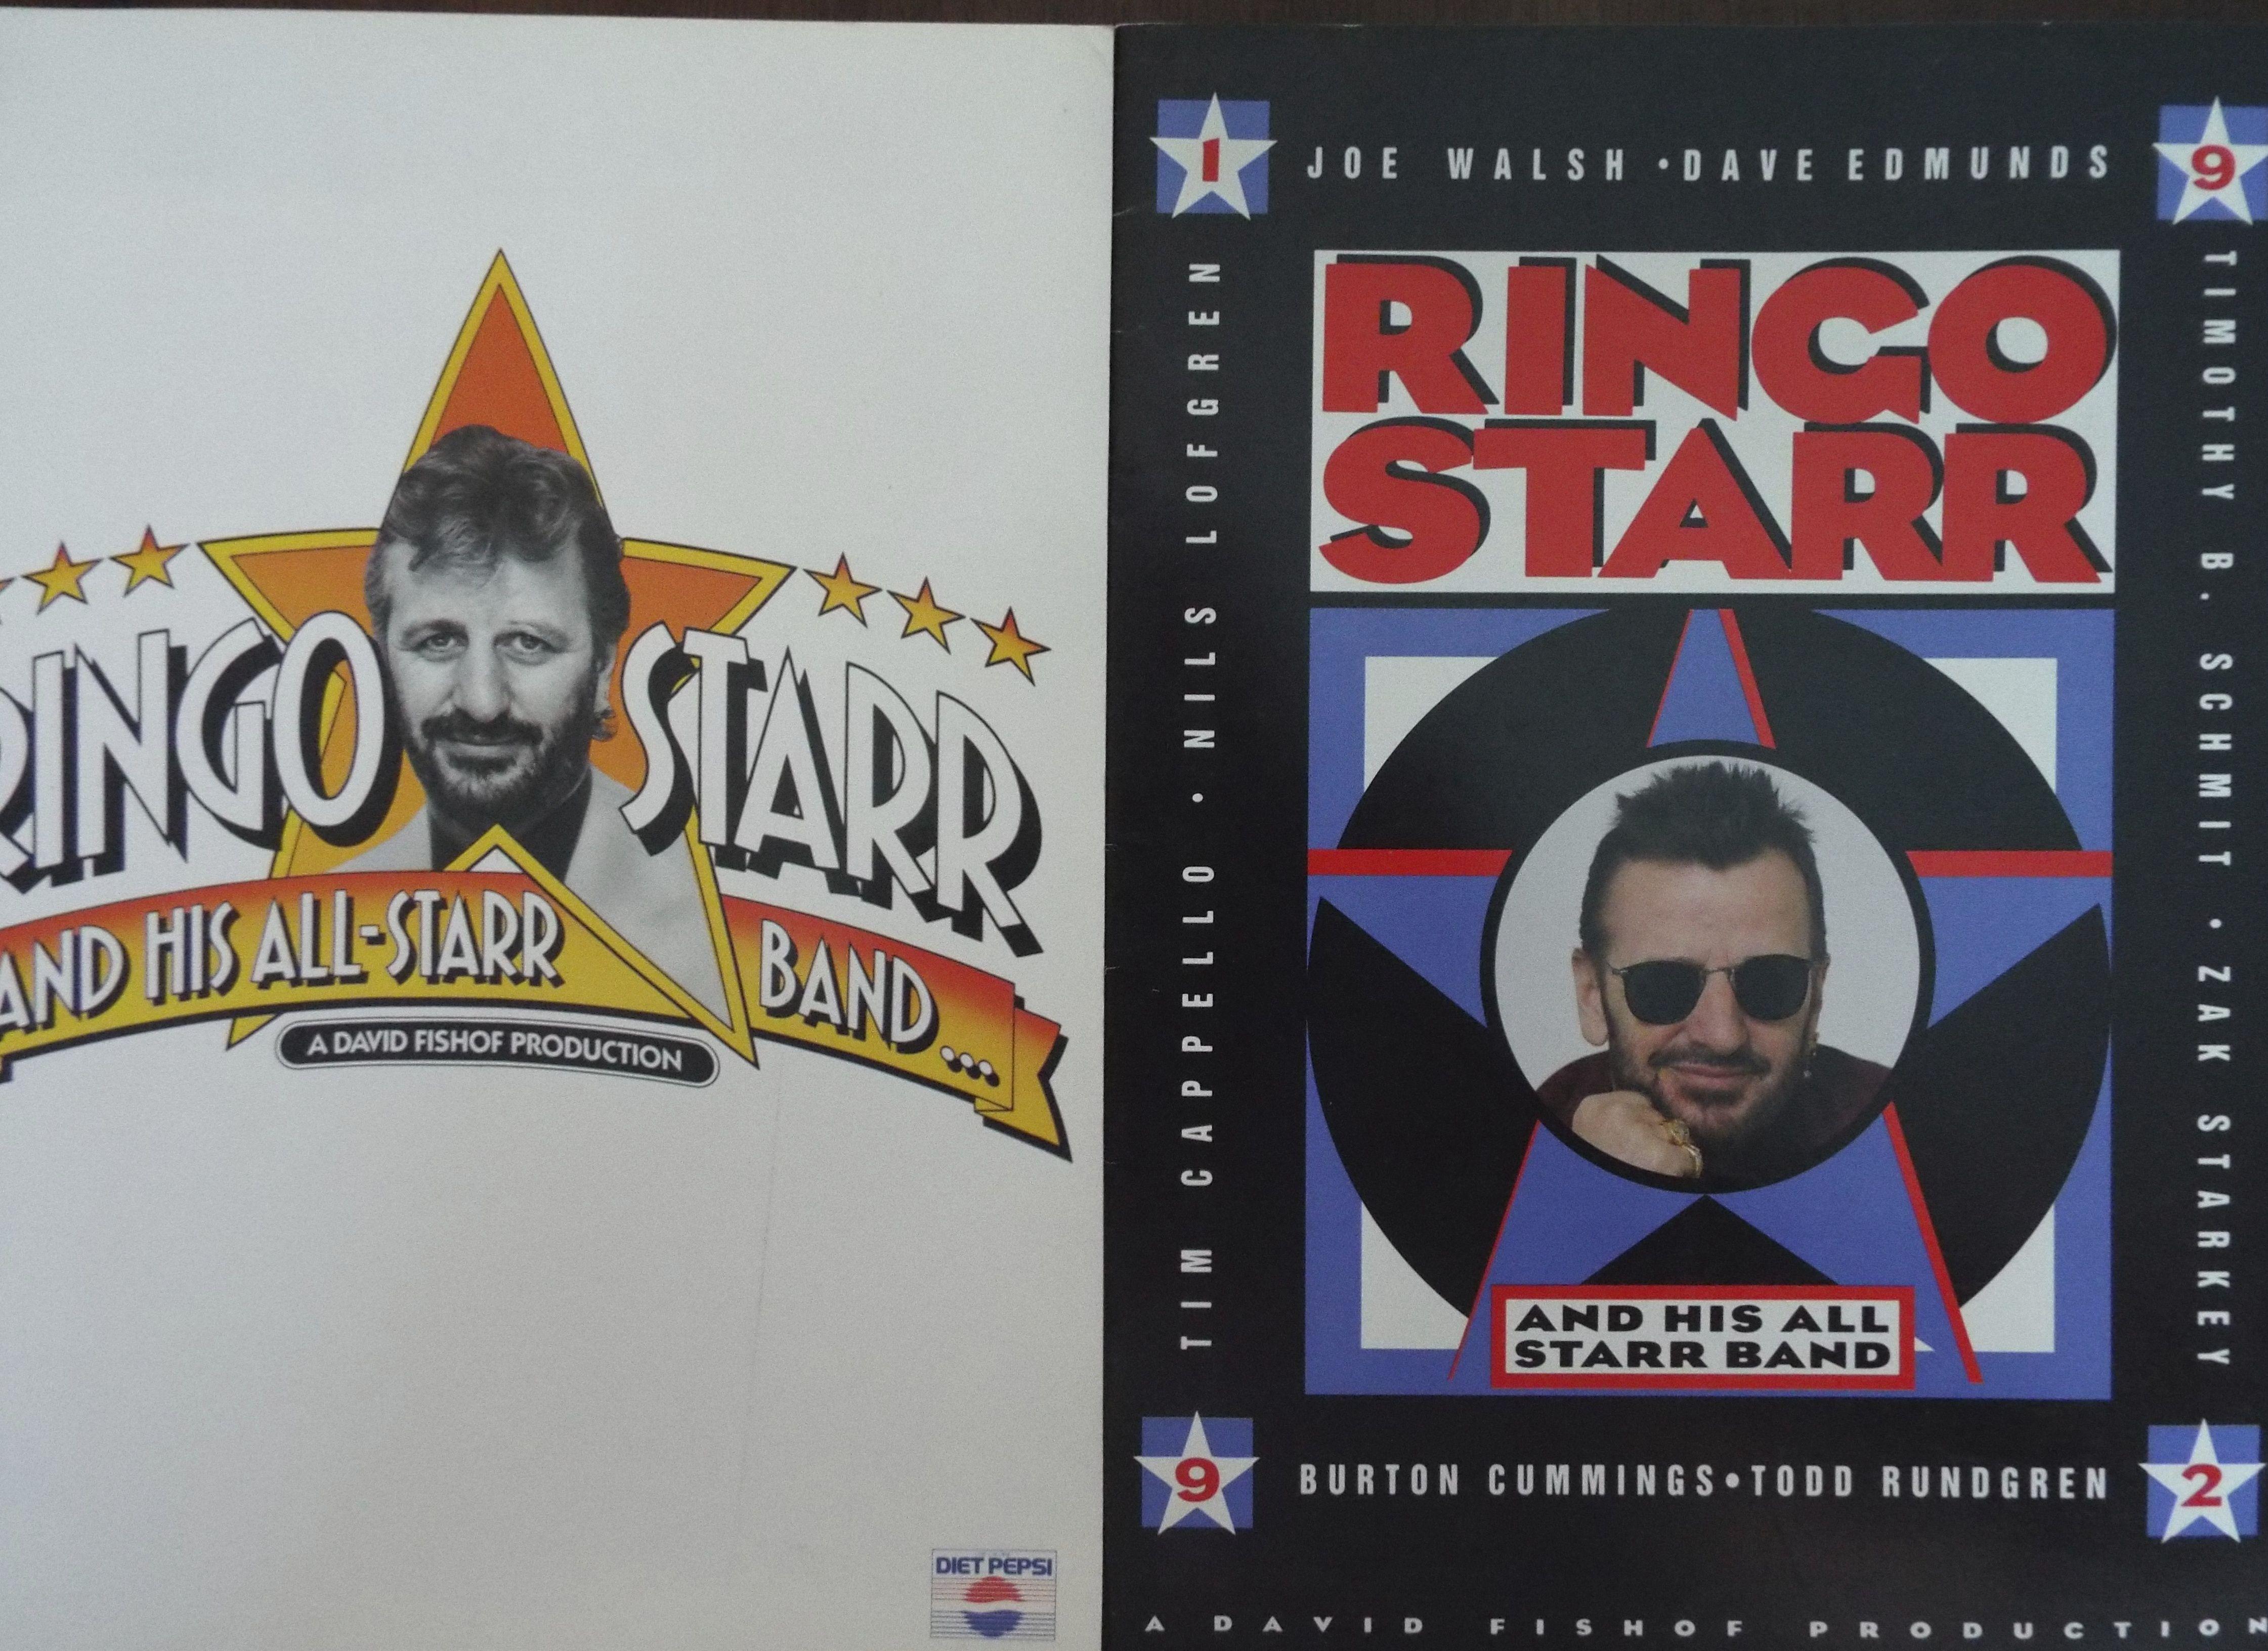 Ringo Starr & His All Starr Band Shoreline 1989 1992 ...